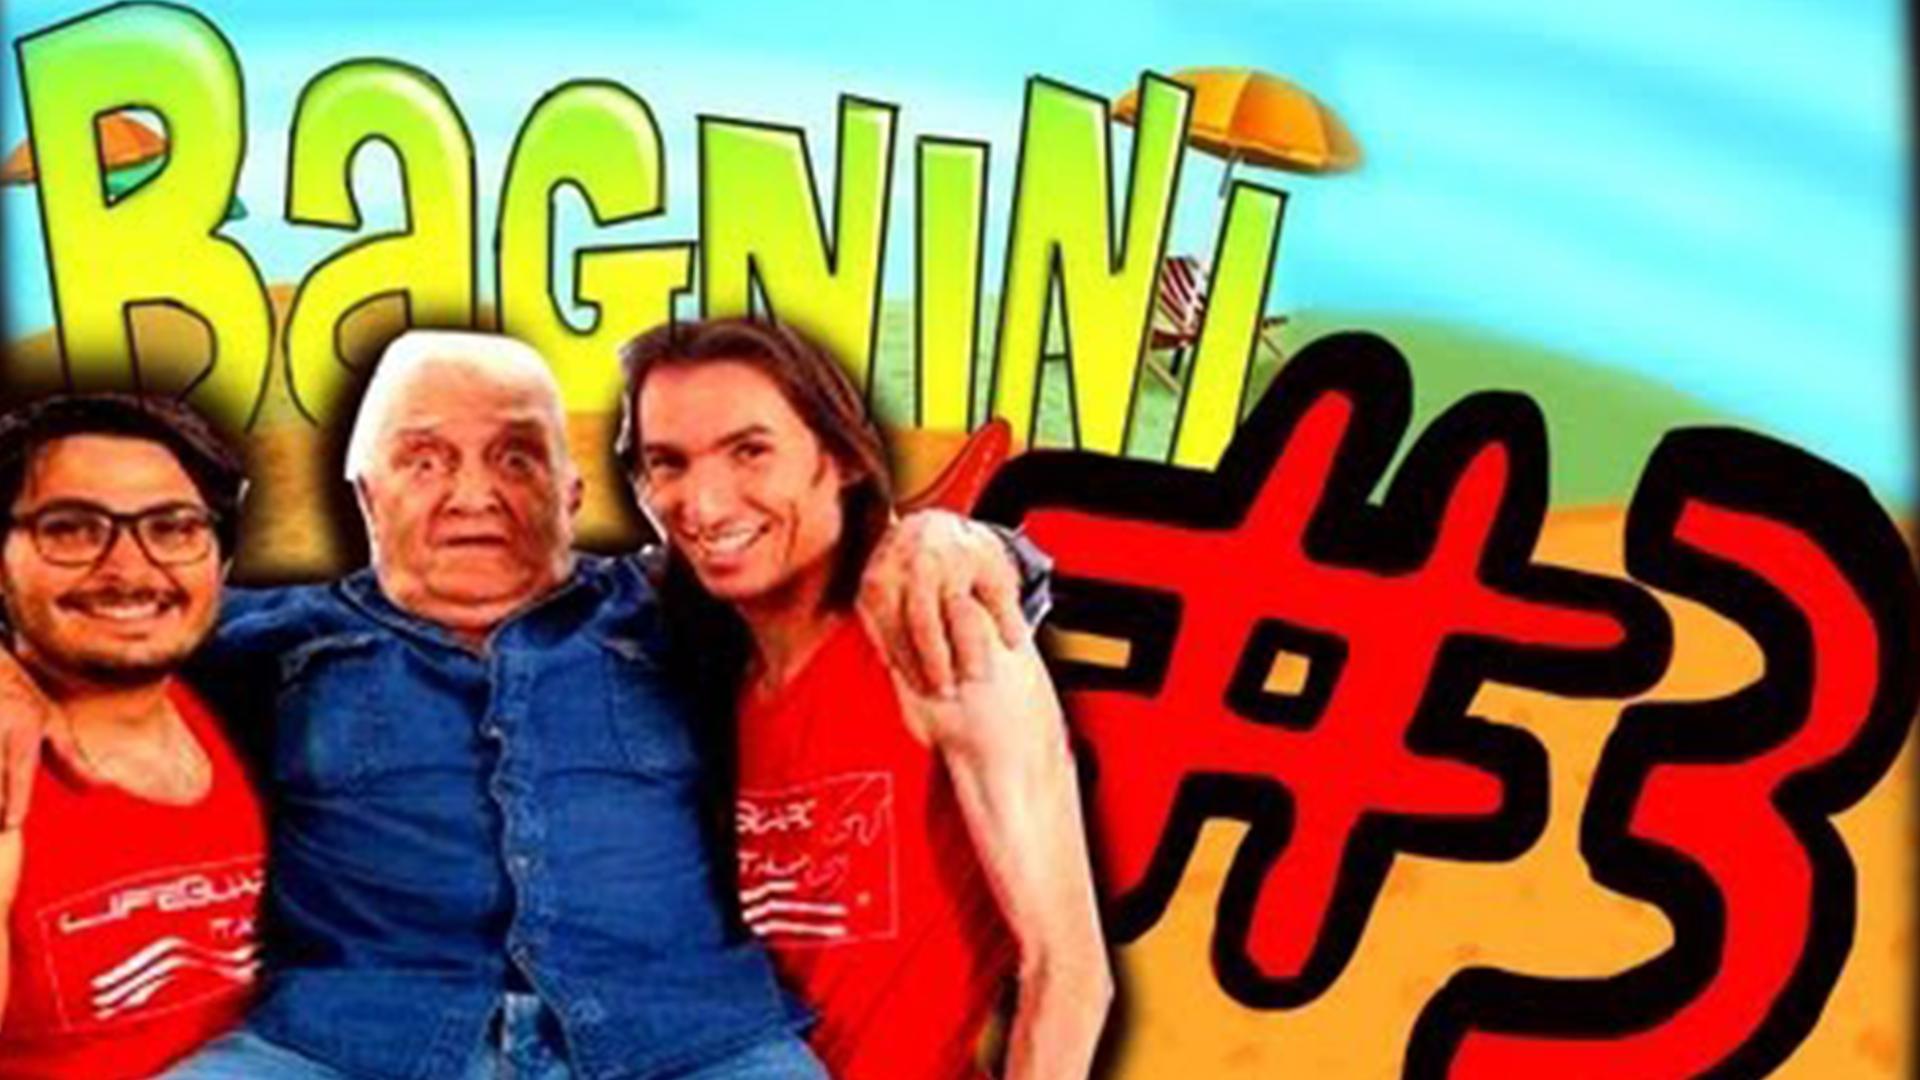 Bagnini-3 Web Serie